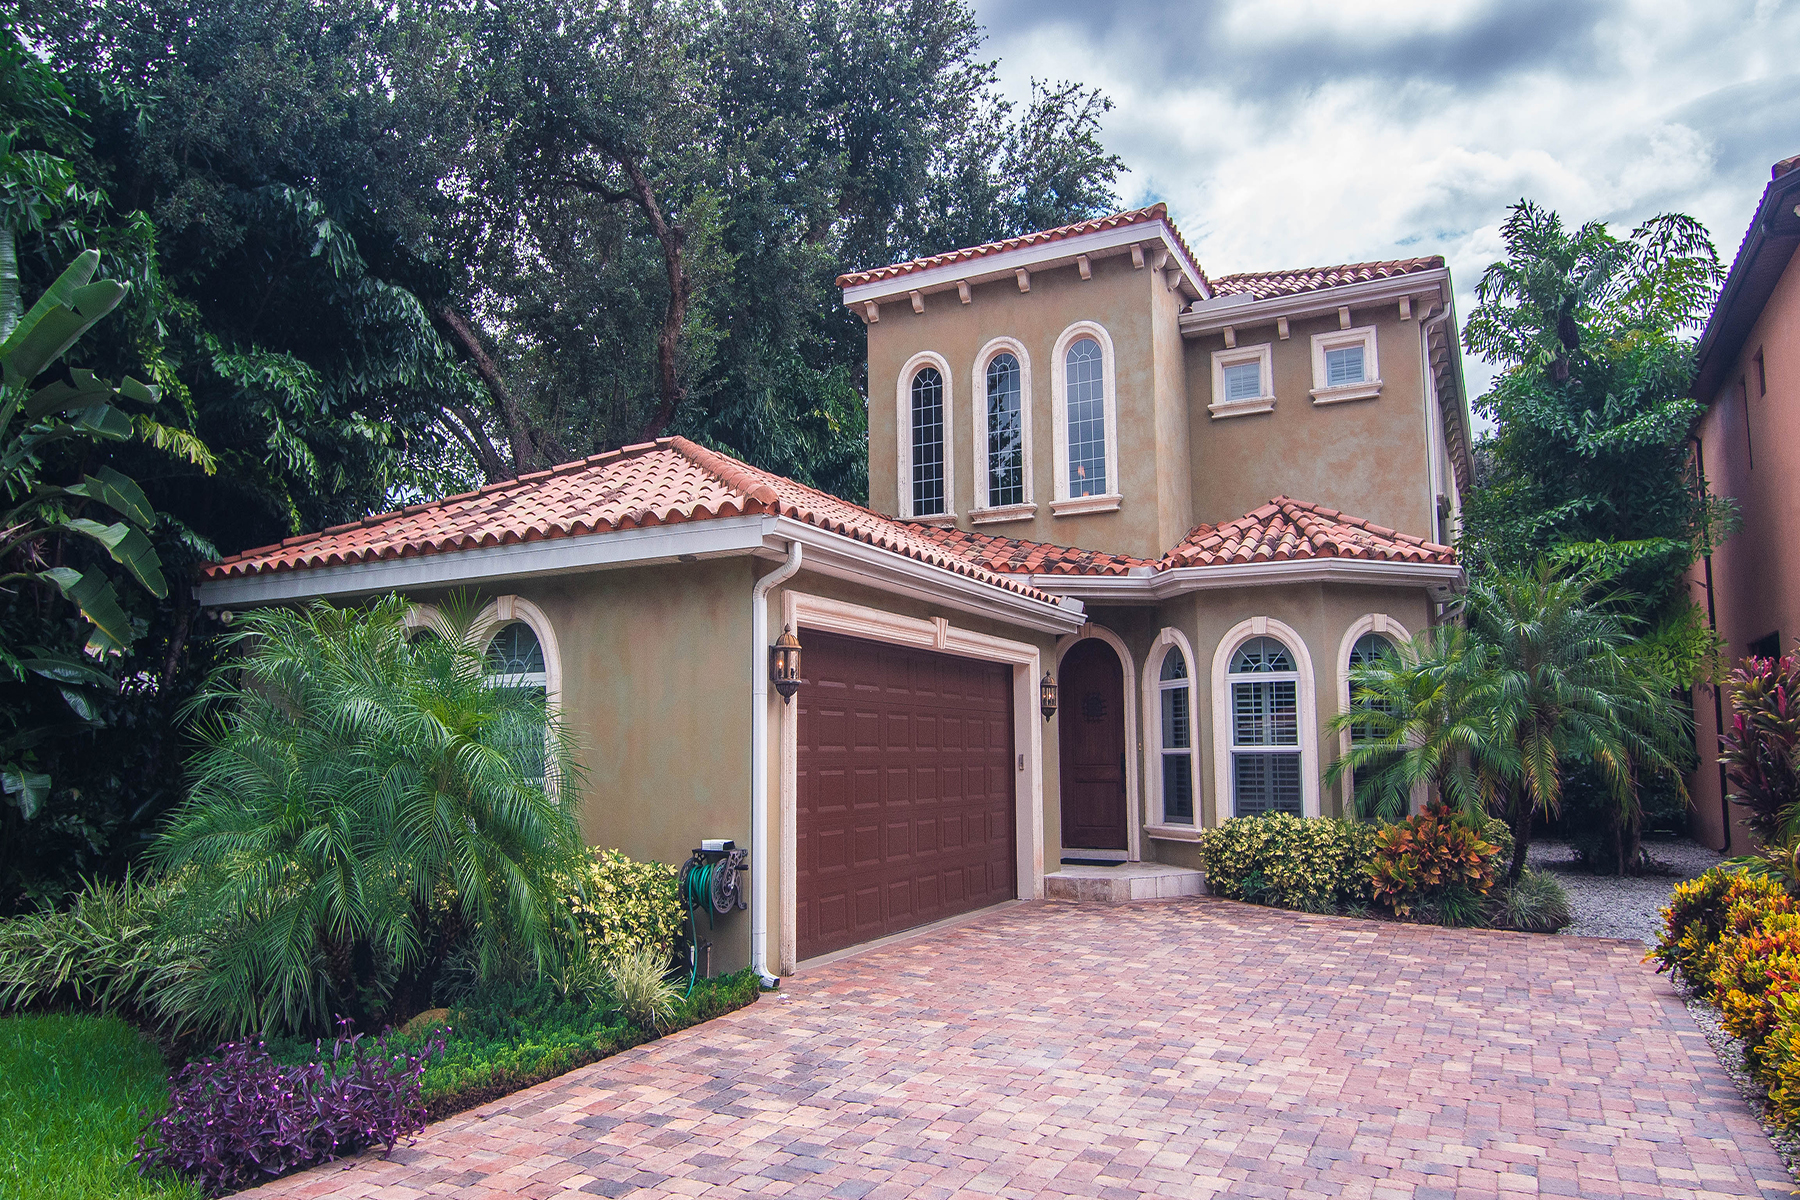 Moradia para Venda às SOUTH TAMPA 6008 Interbay Blvd Tampa, Florida 33611 Estados Unidos